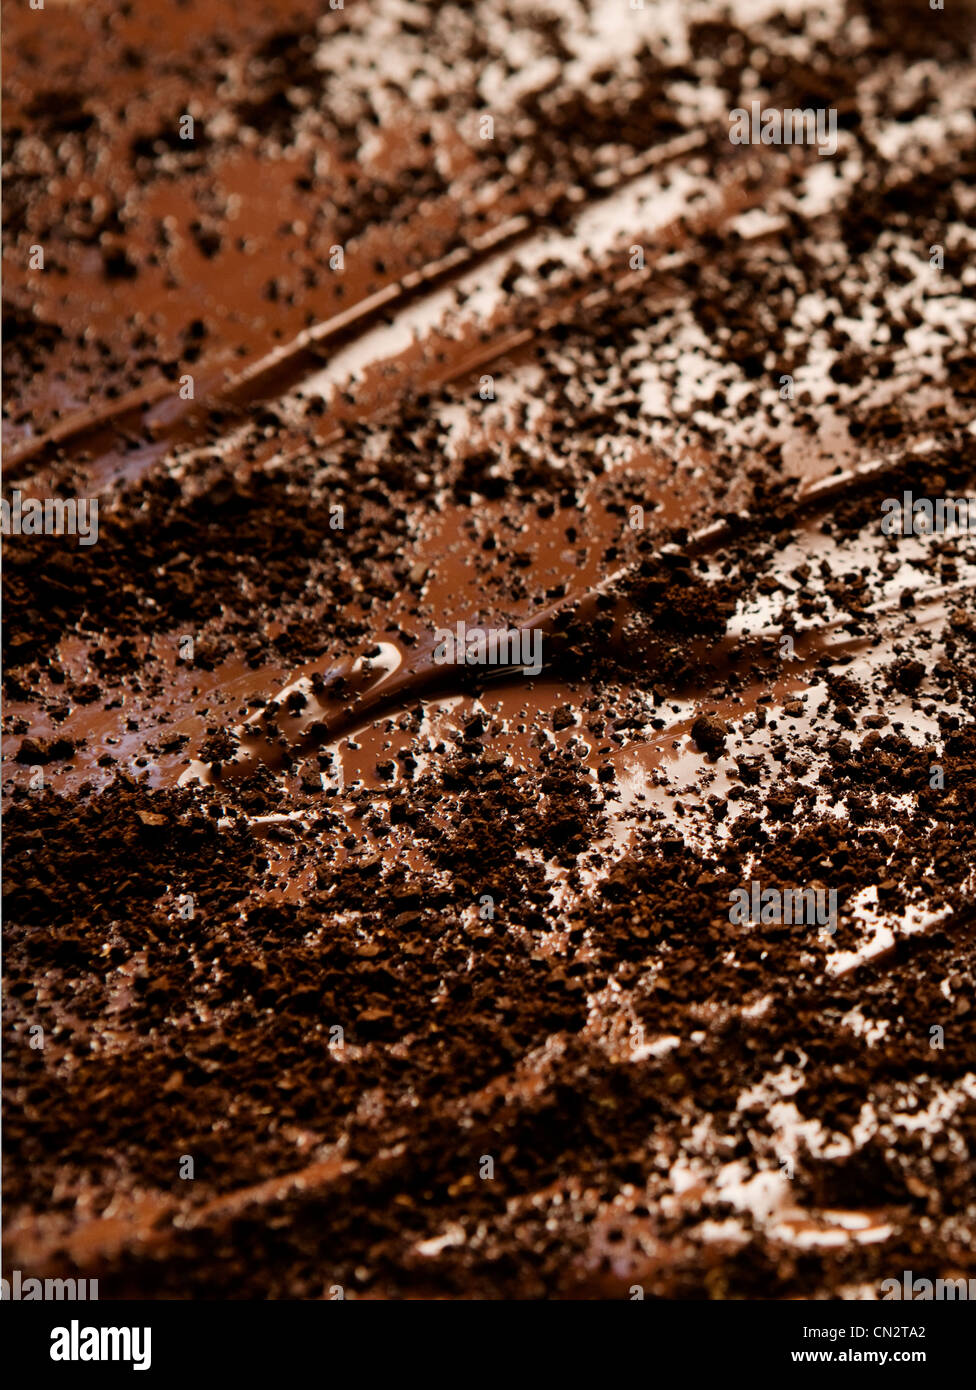 Cobertura de chocolate, full frame Imagen De Stock